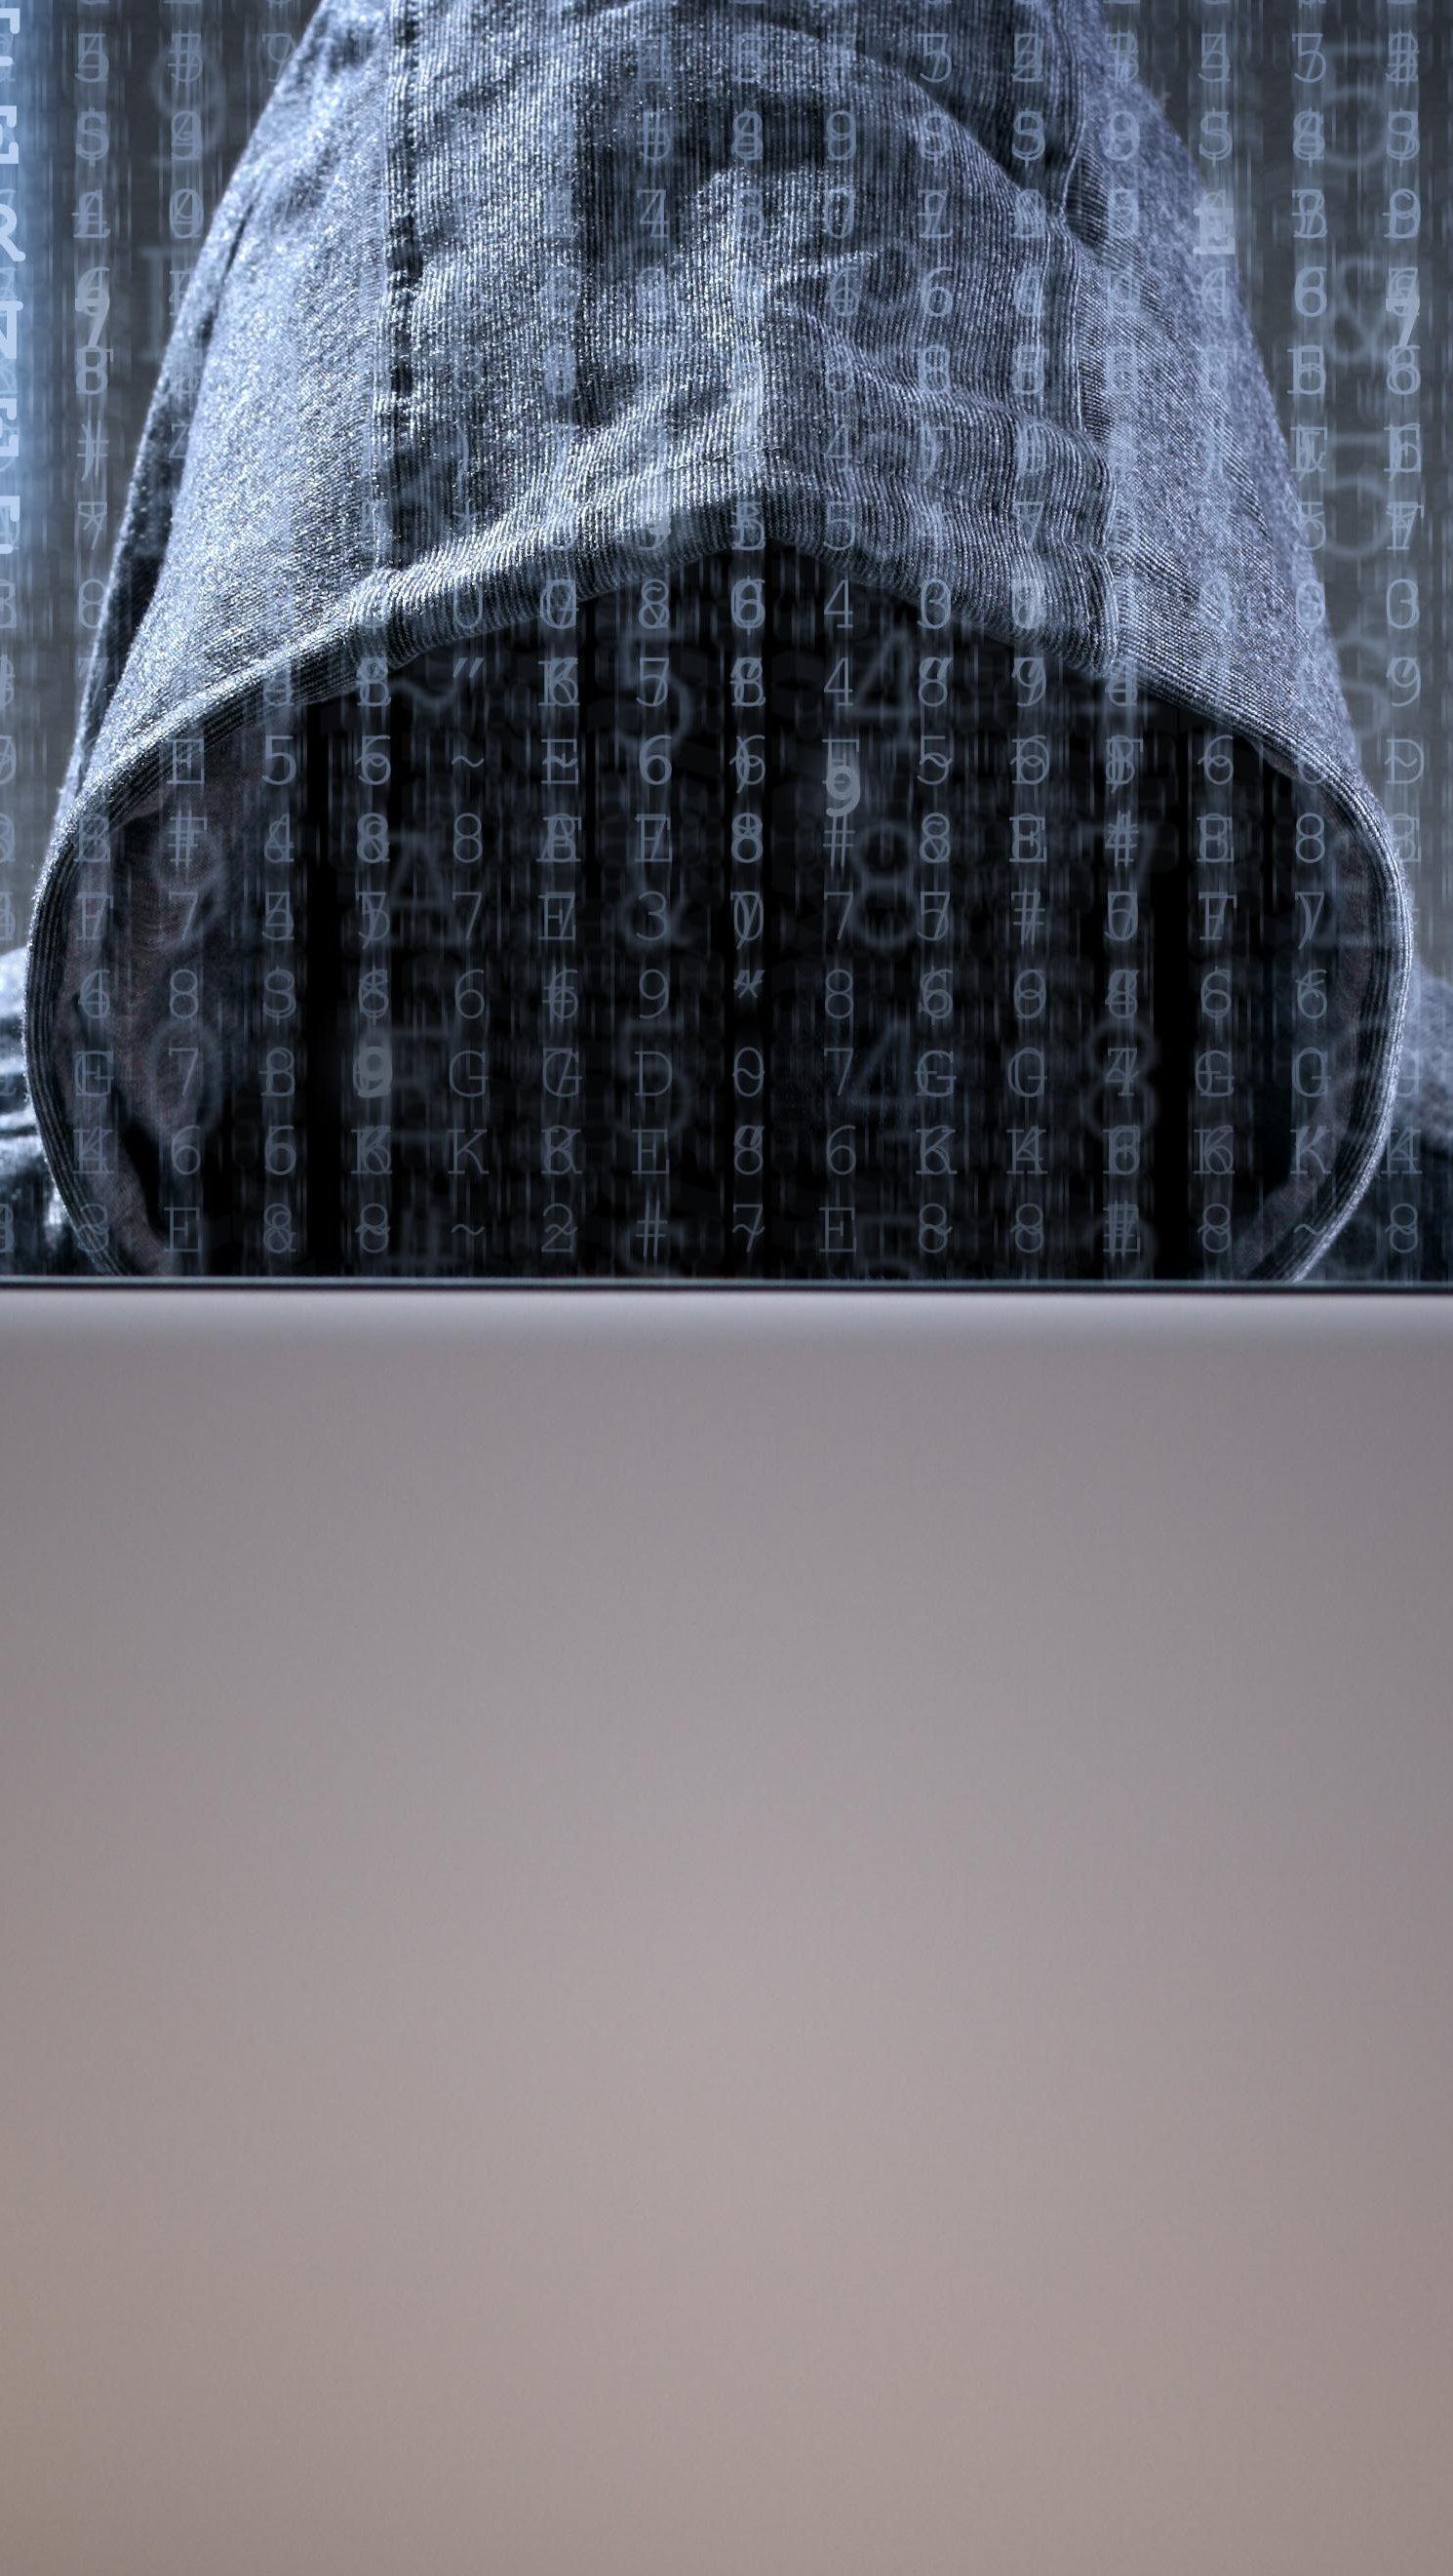 Fondos de pantalla Hacker Vertical